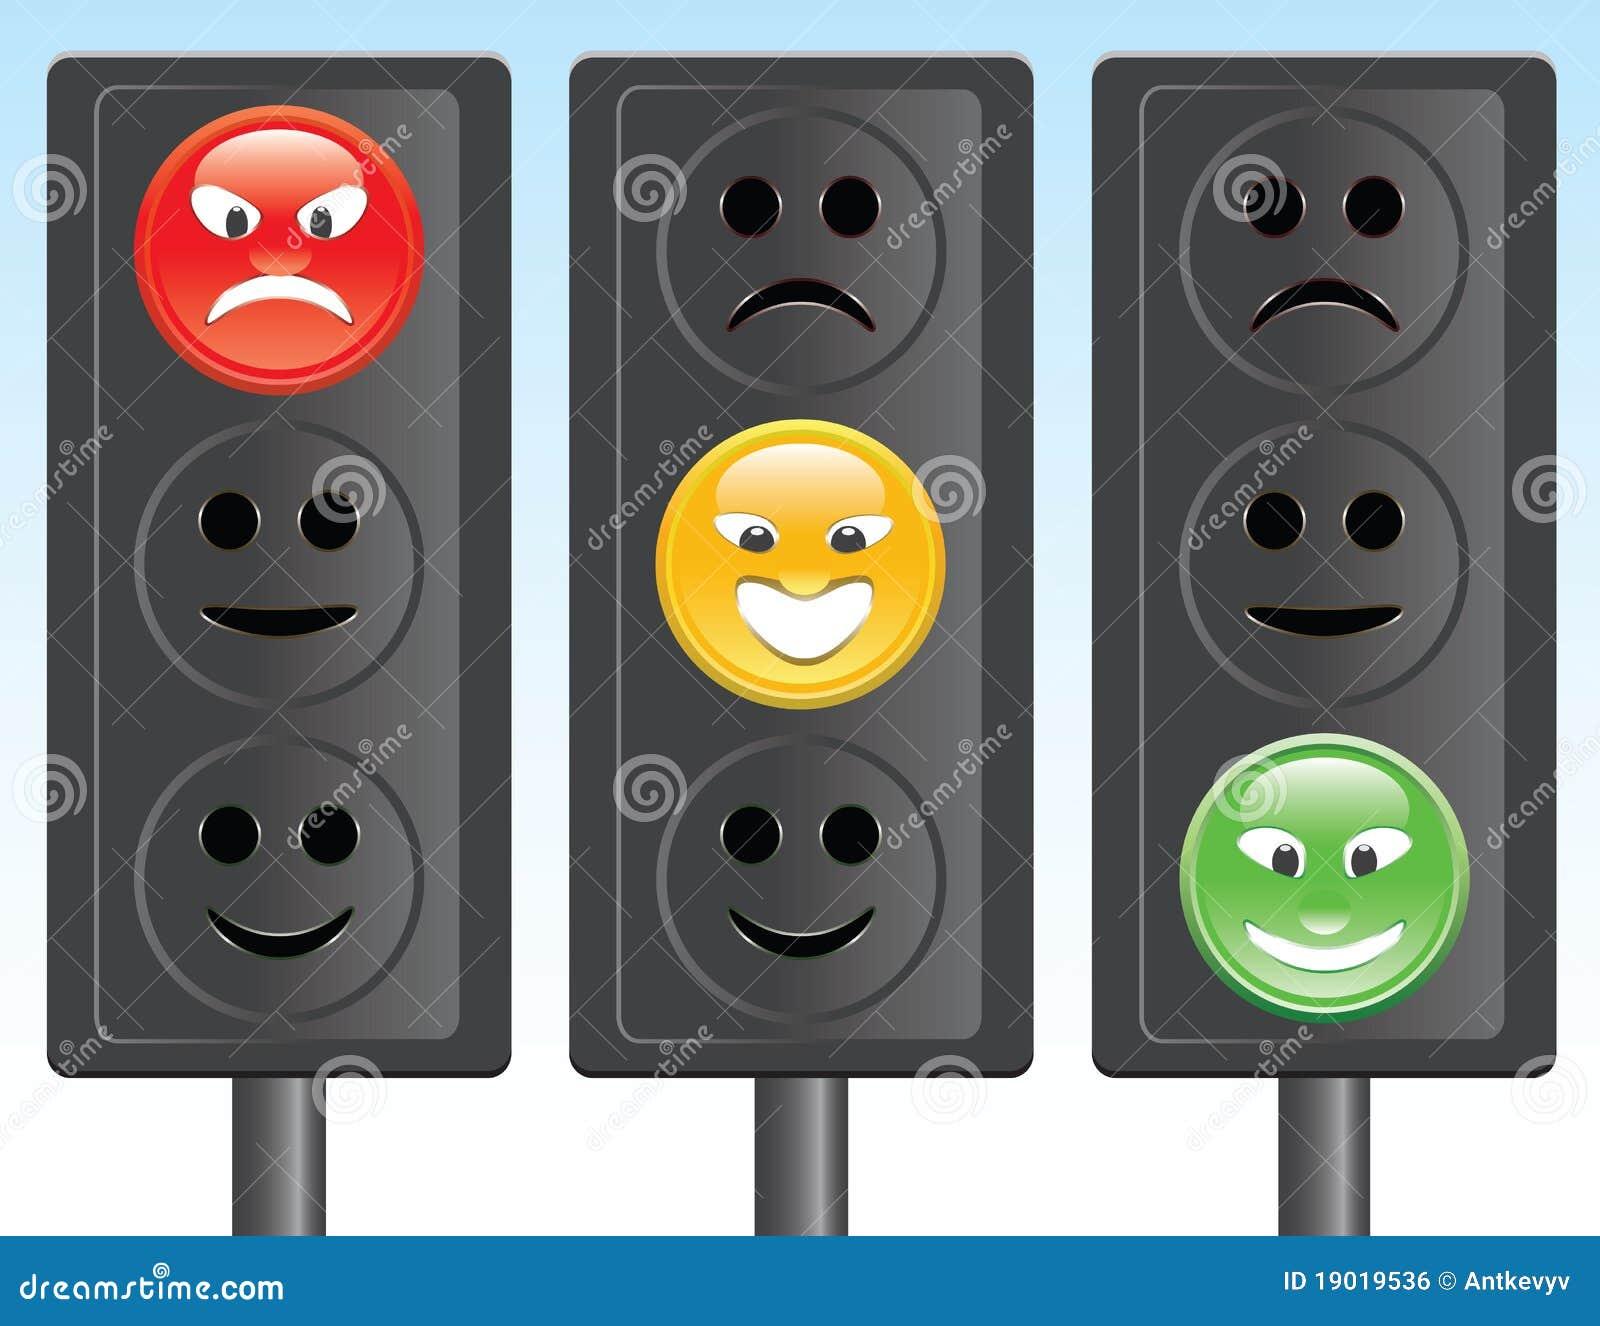 Traffic light smiley